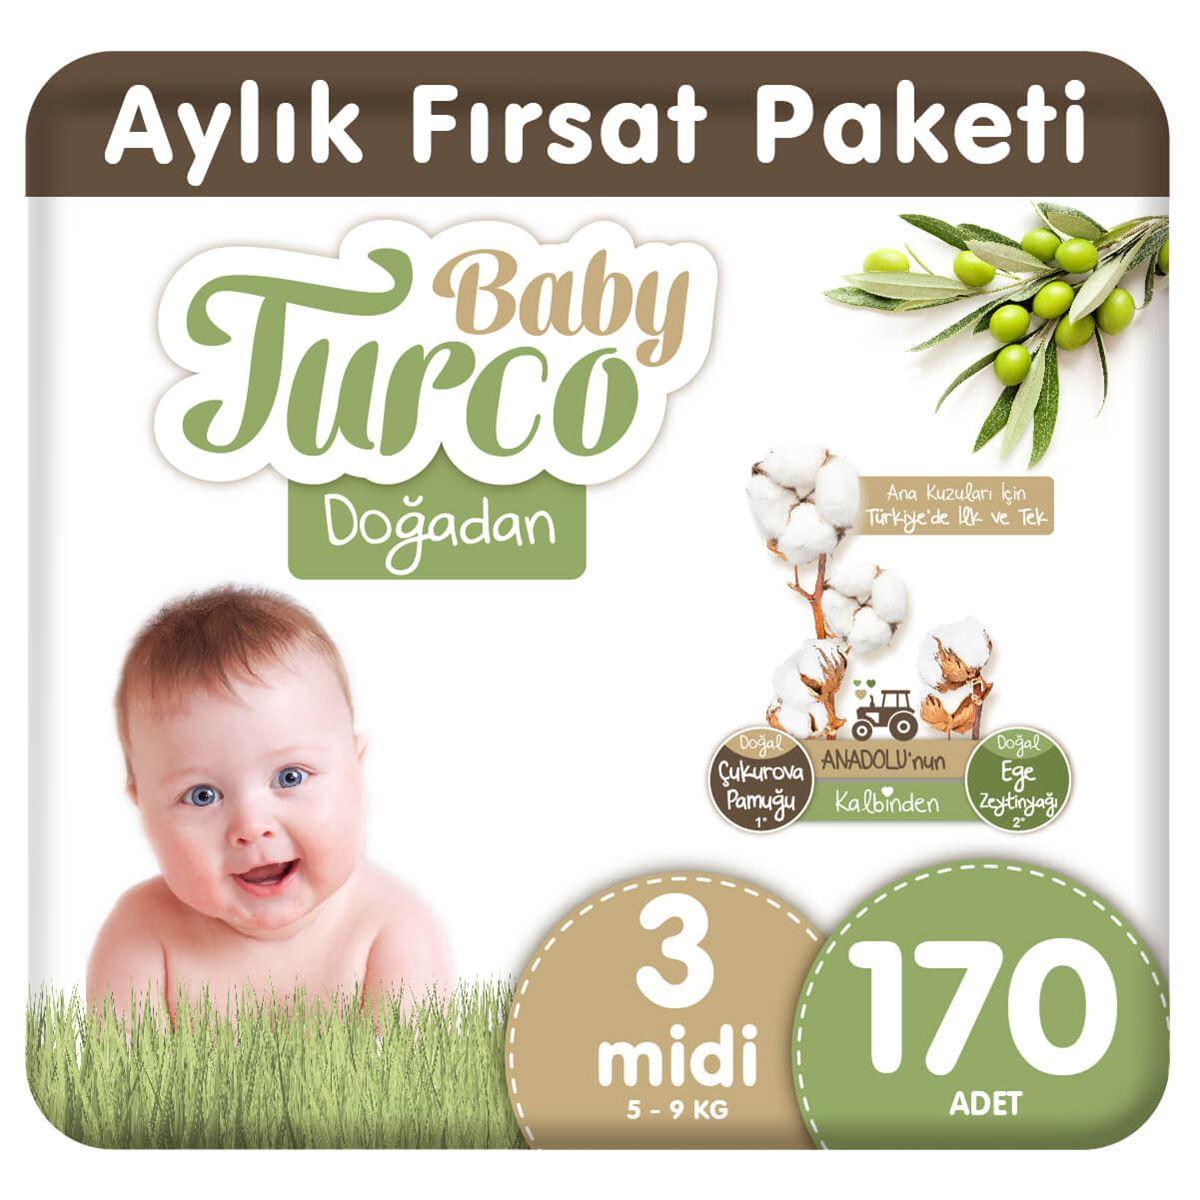 Baby Turco Doğadan 3 Numara Midi 170 Adet